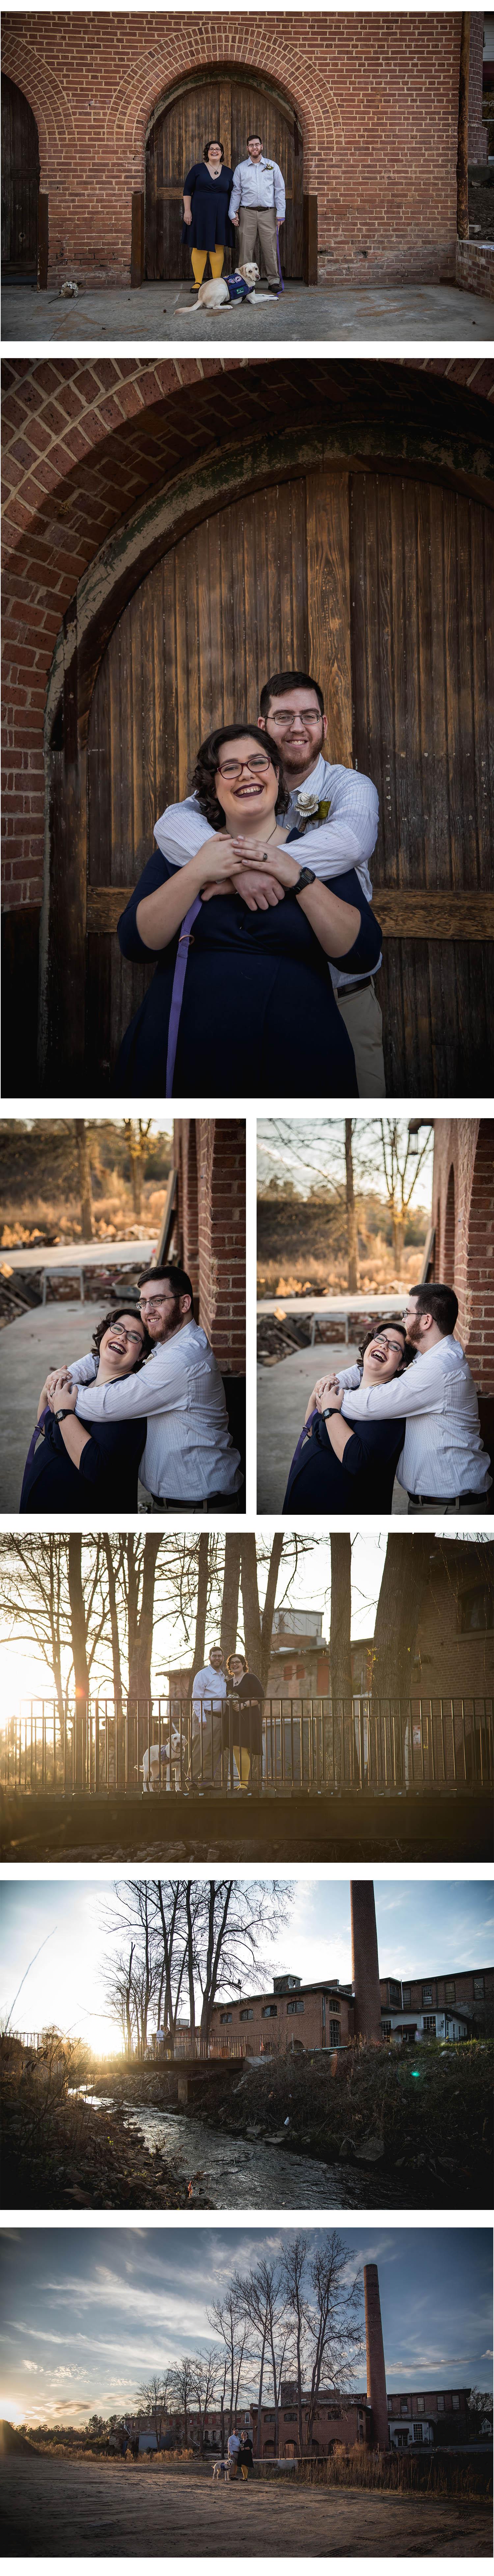 Northern Red Photography | Columbia, South Carolina Wedding Photographer